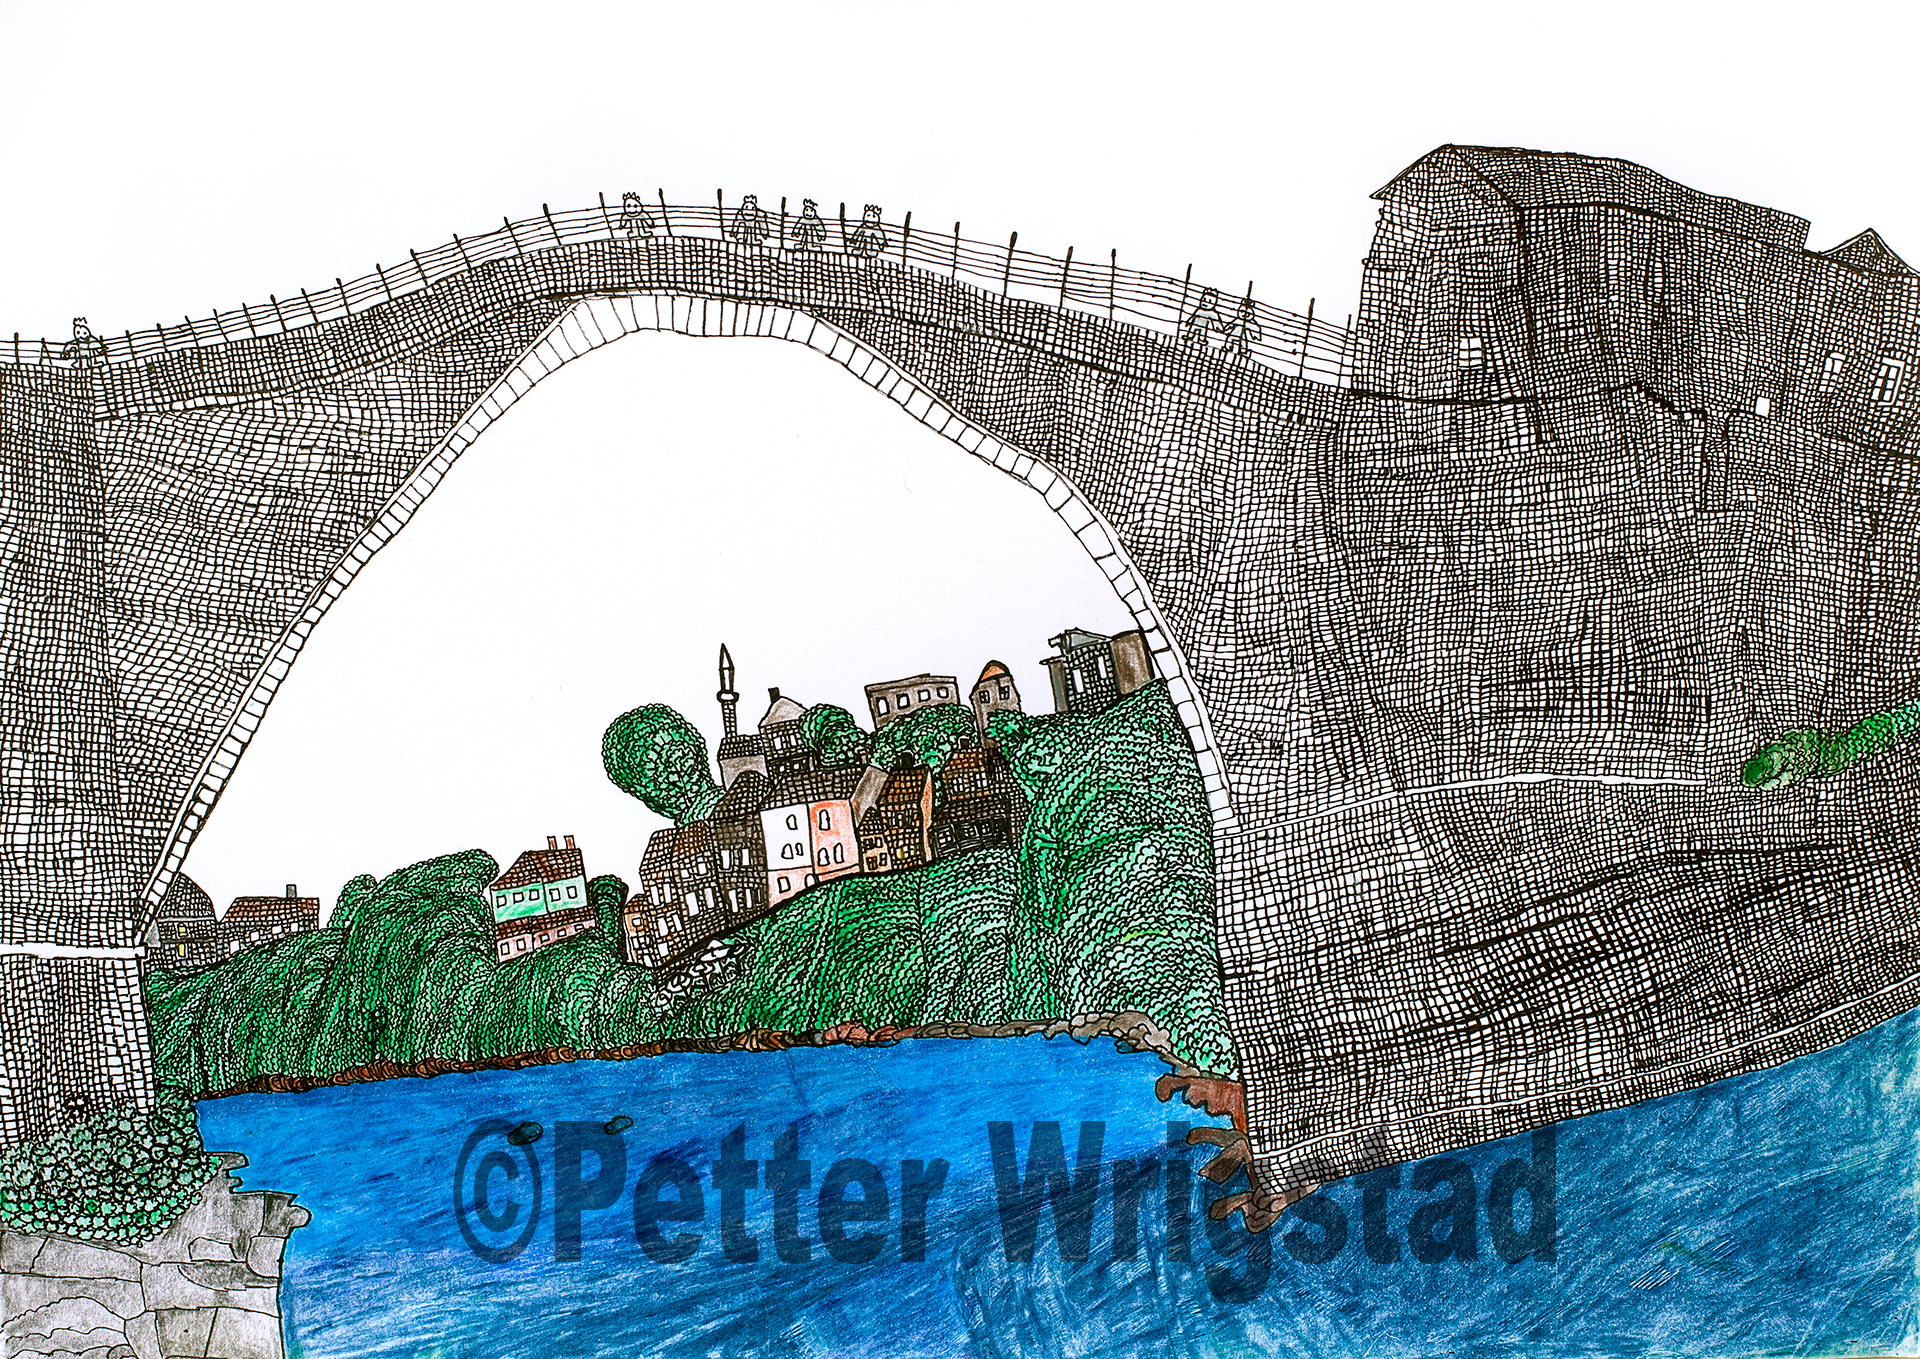 Mostarbron